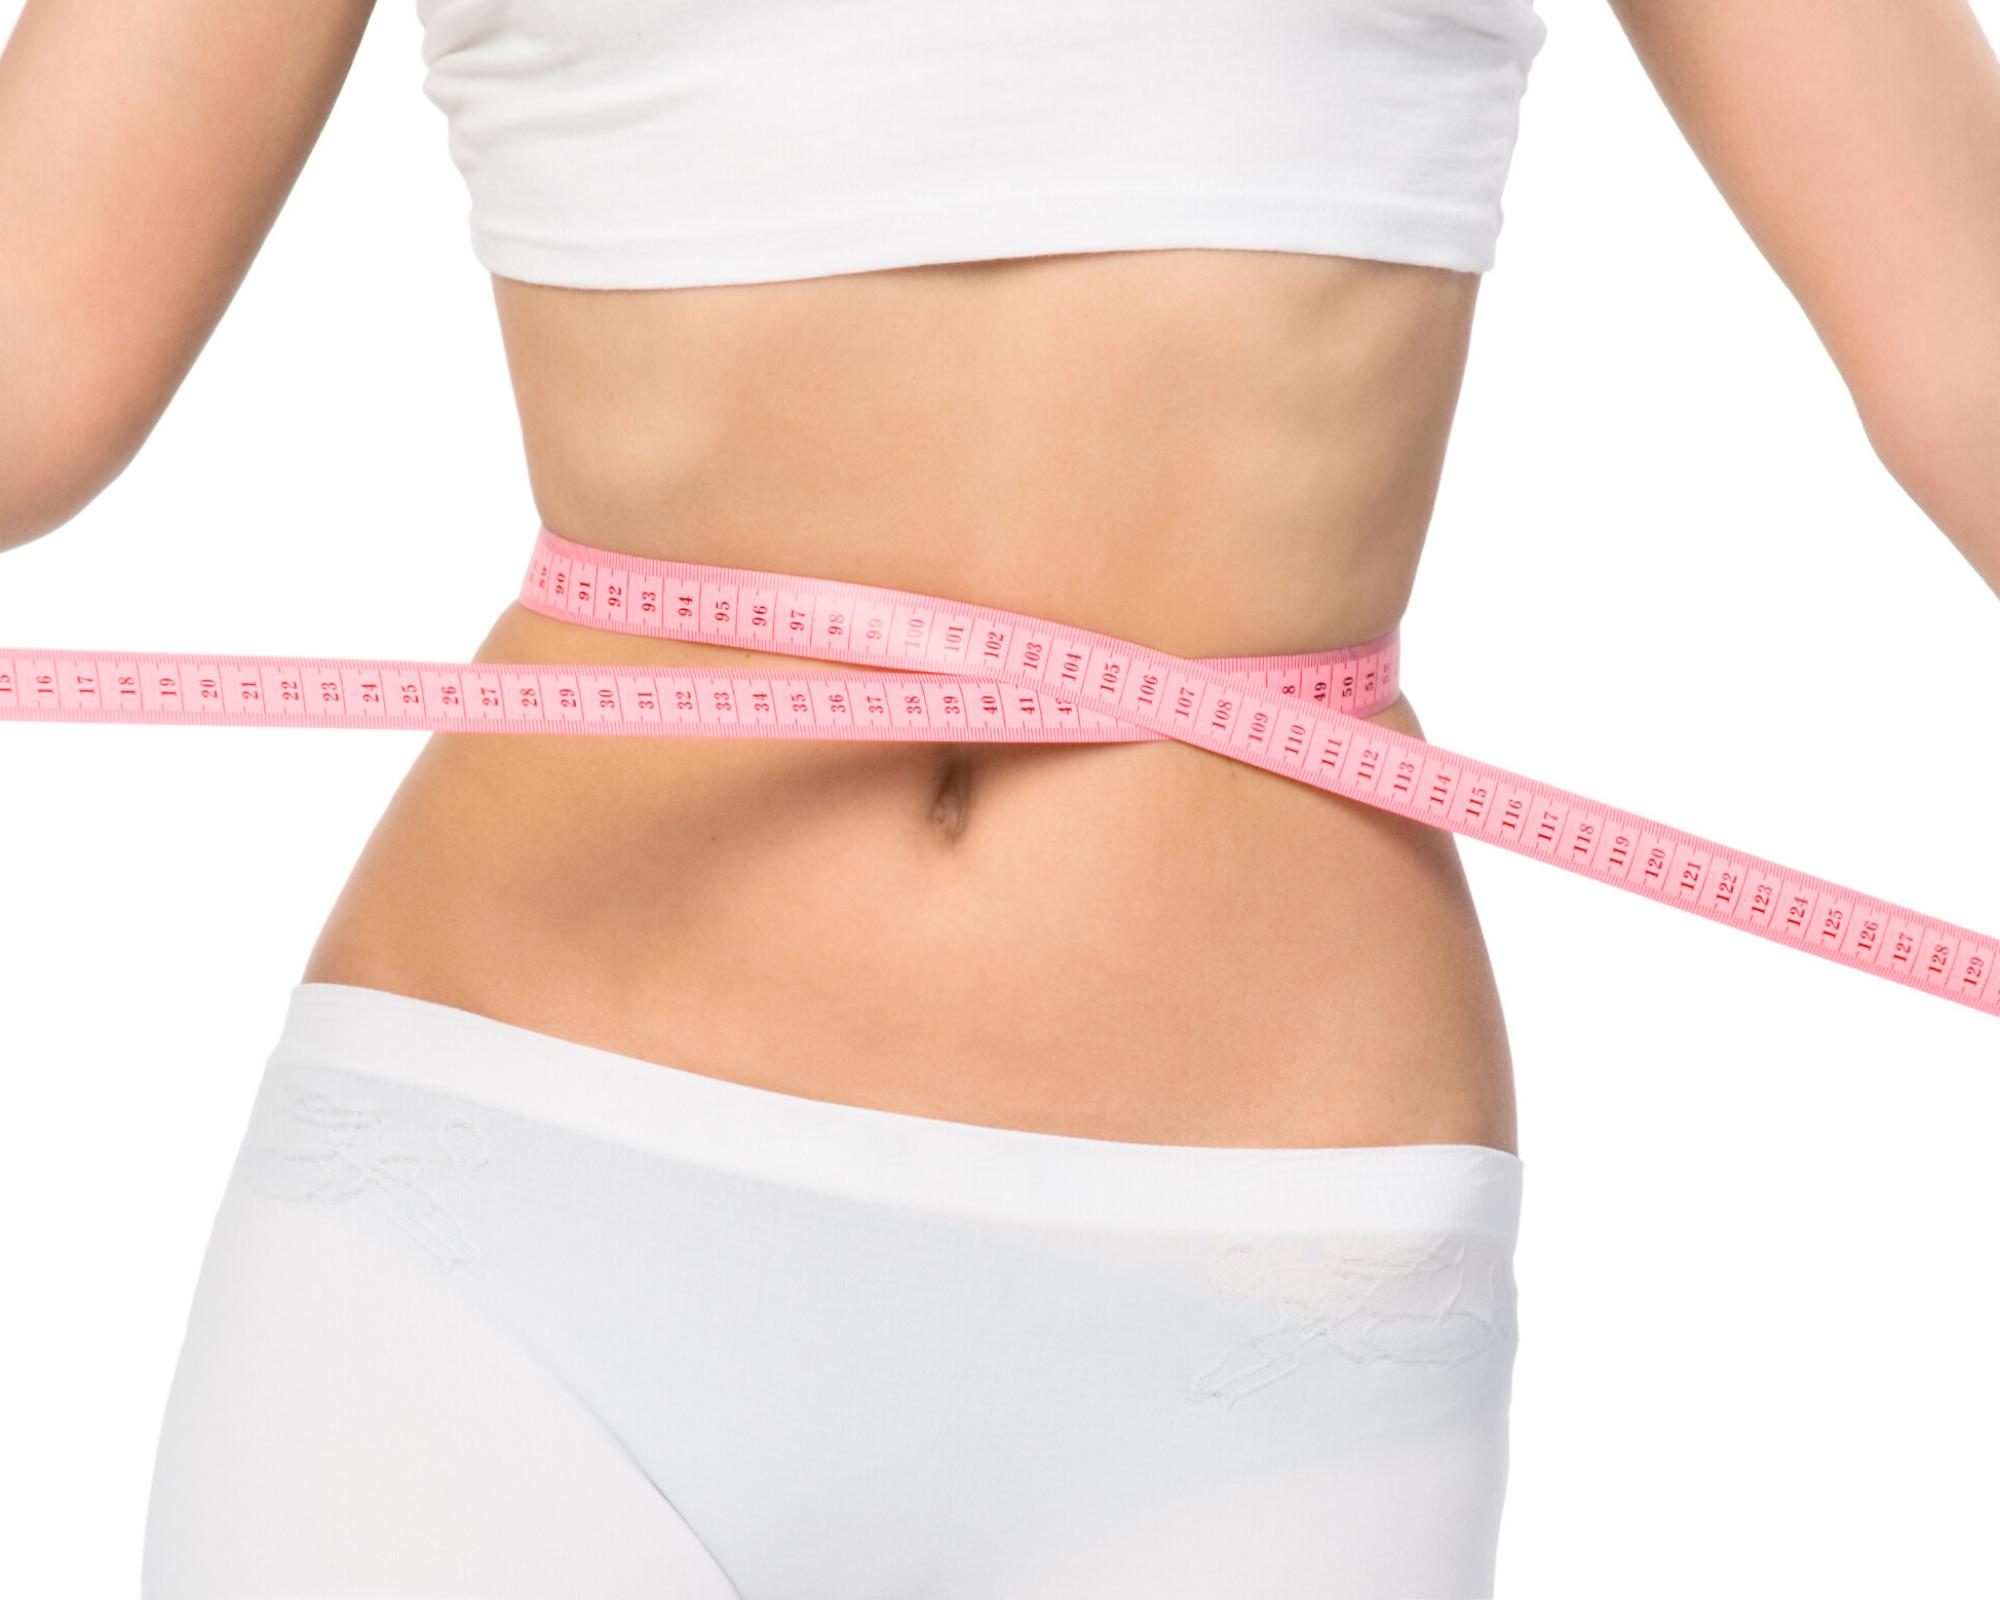 Women measuring her waistline with tape measure.